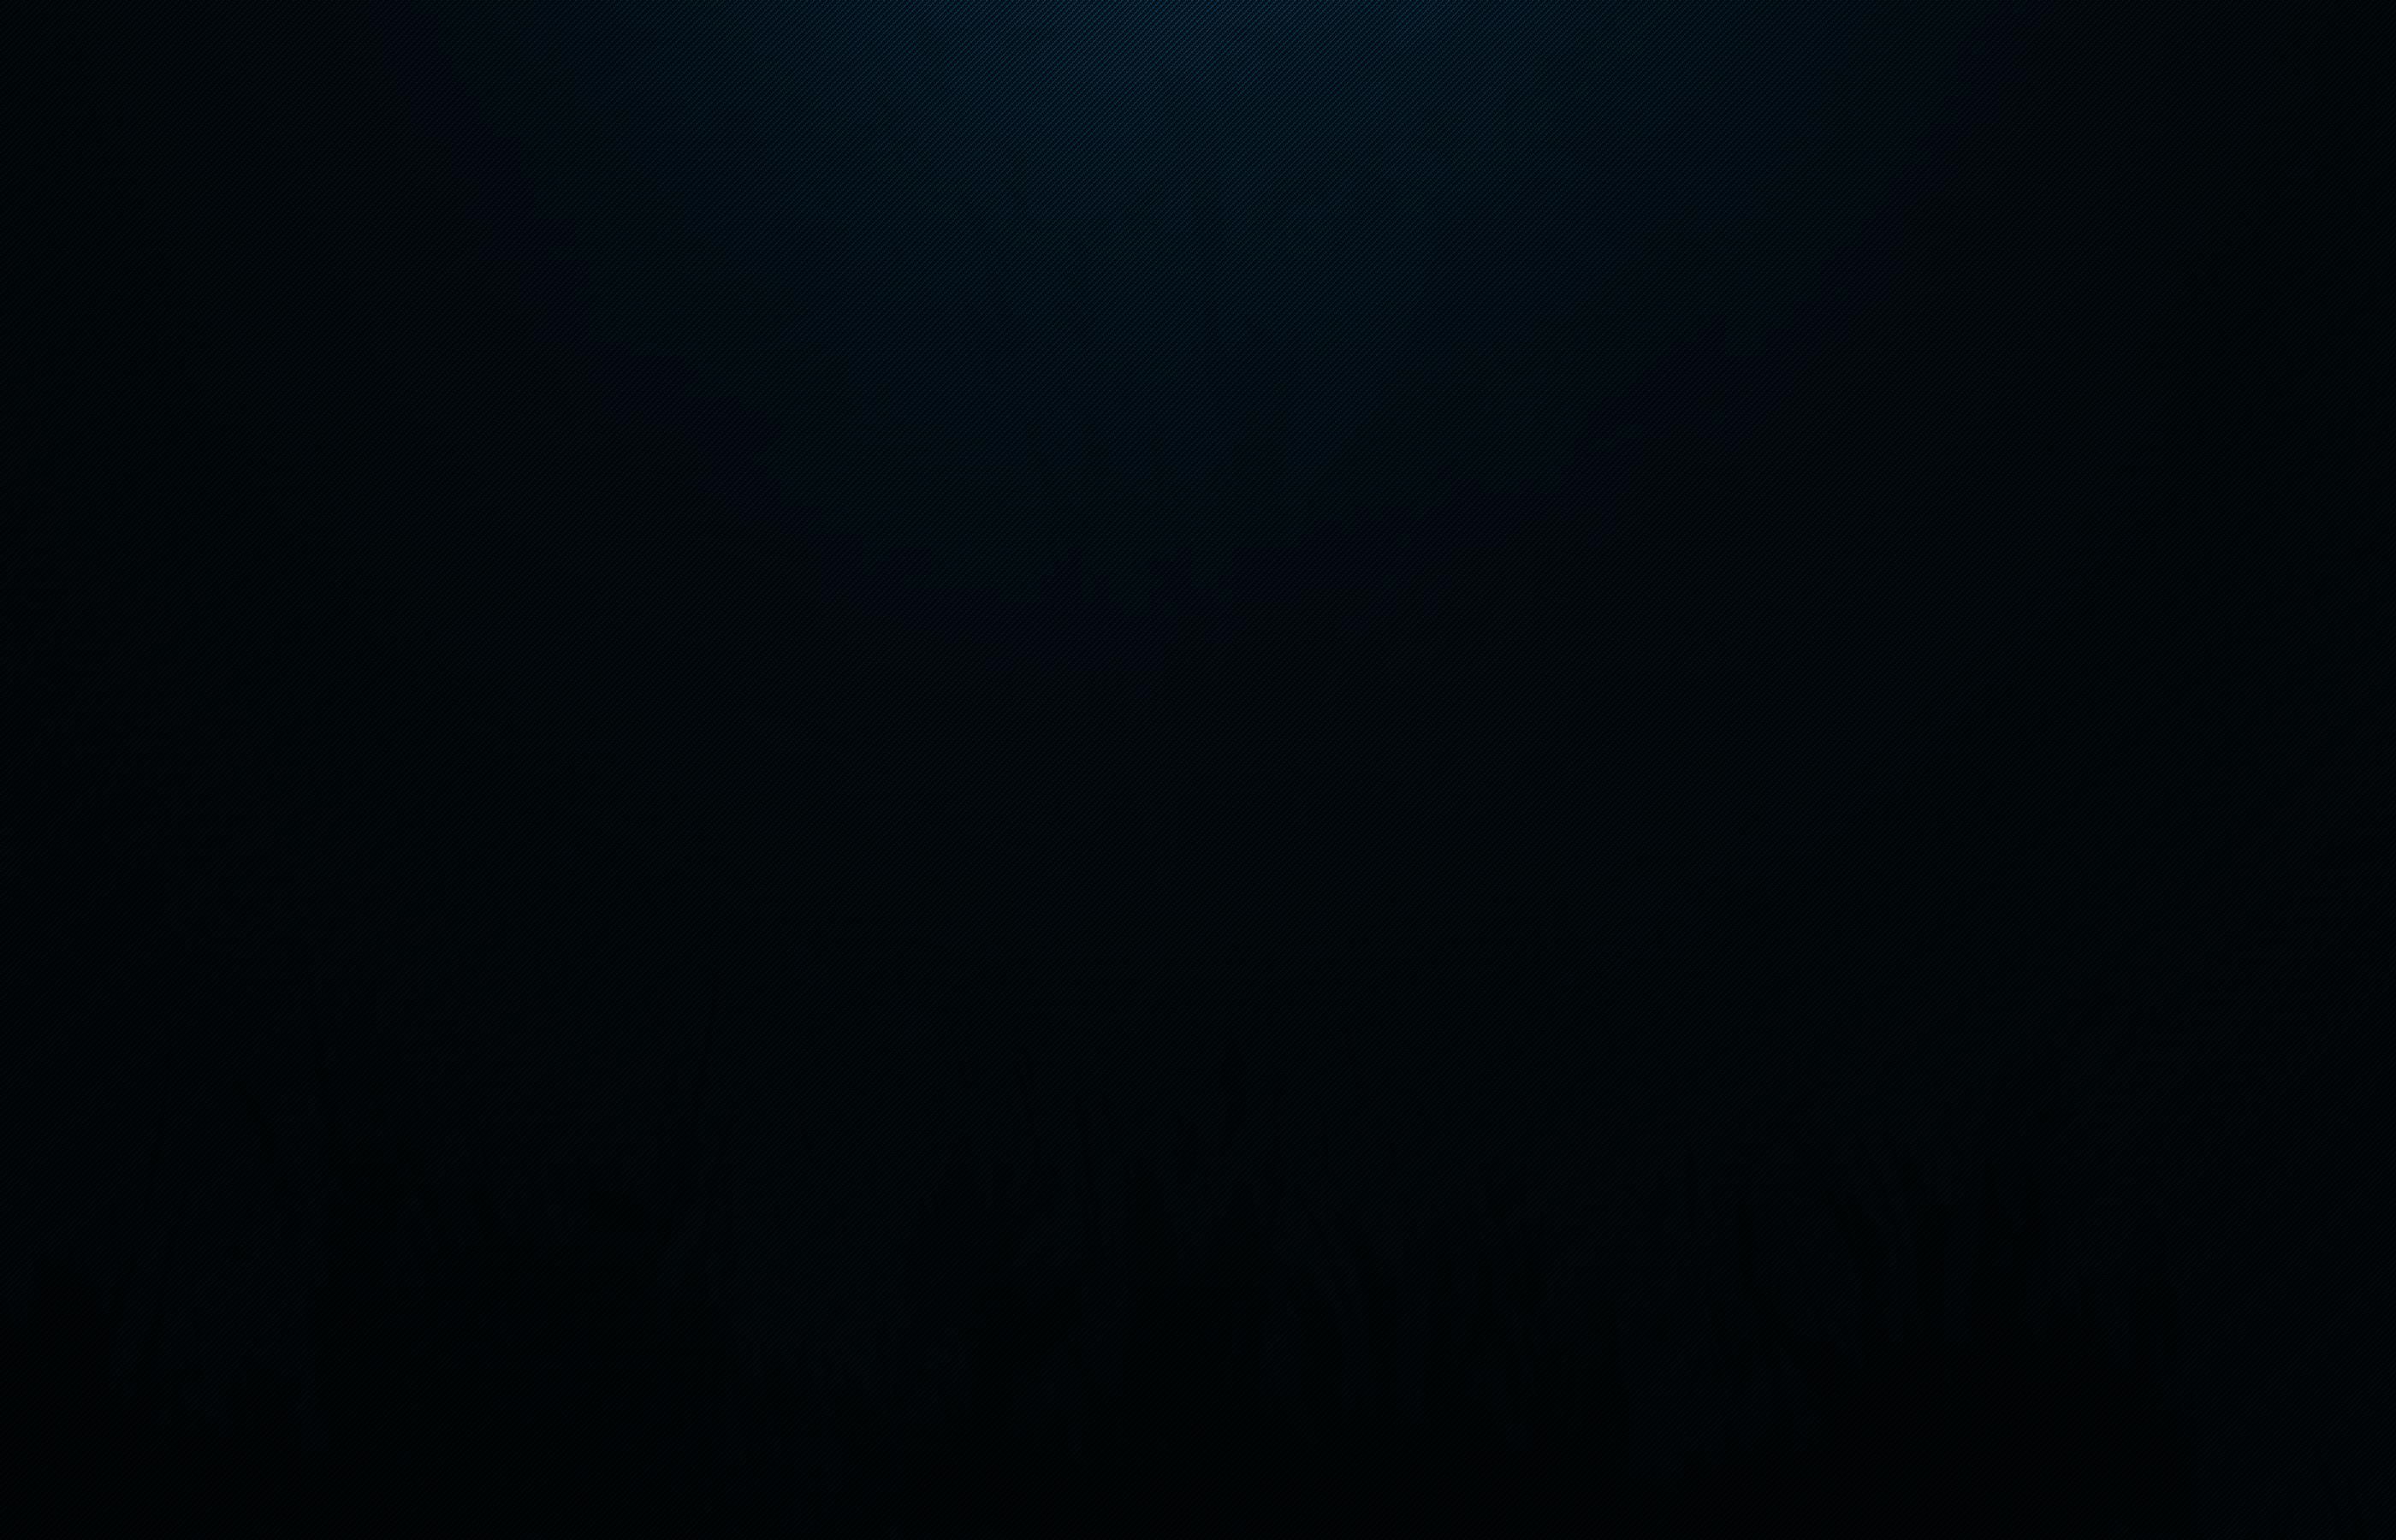 Dark blue pattern wallpaper 2800x1800